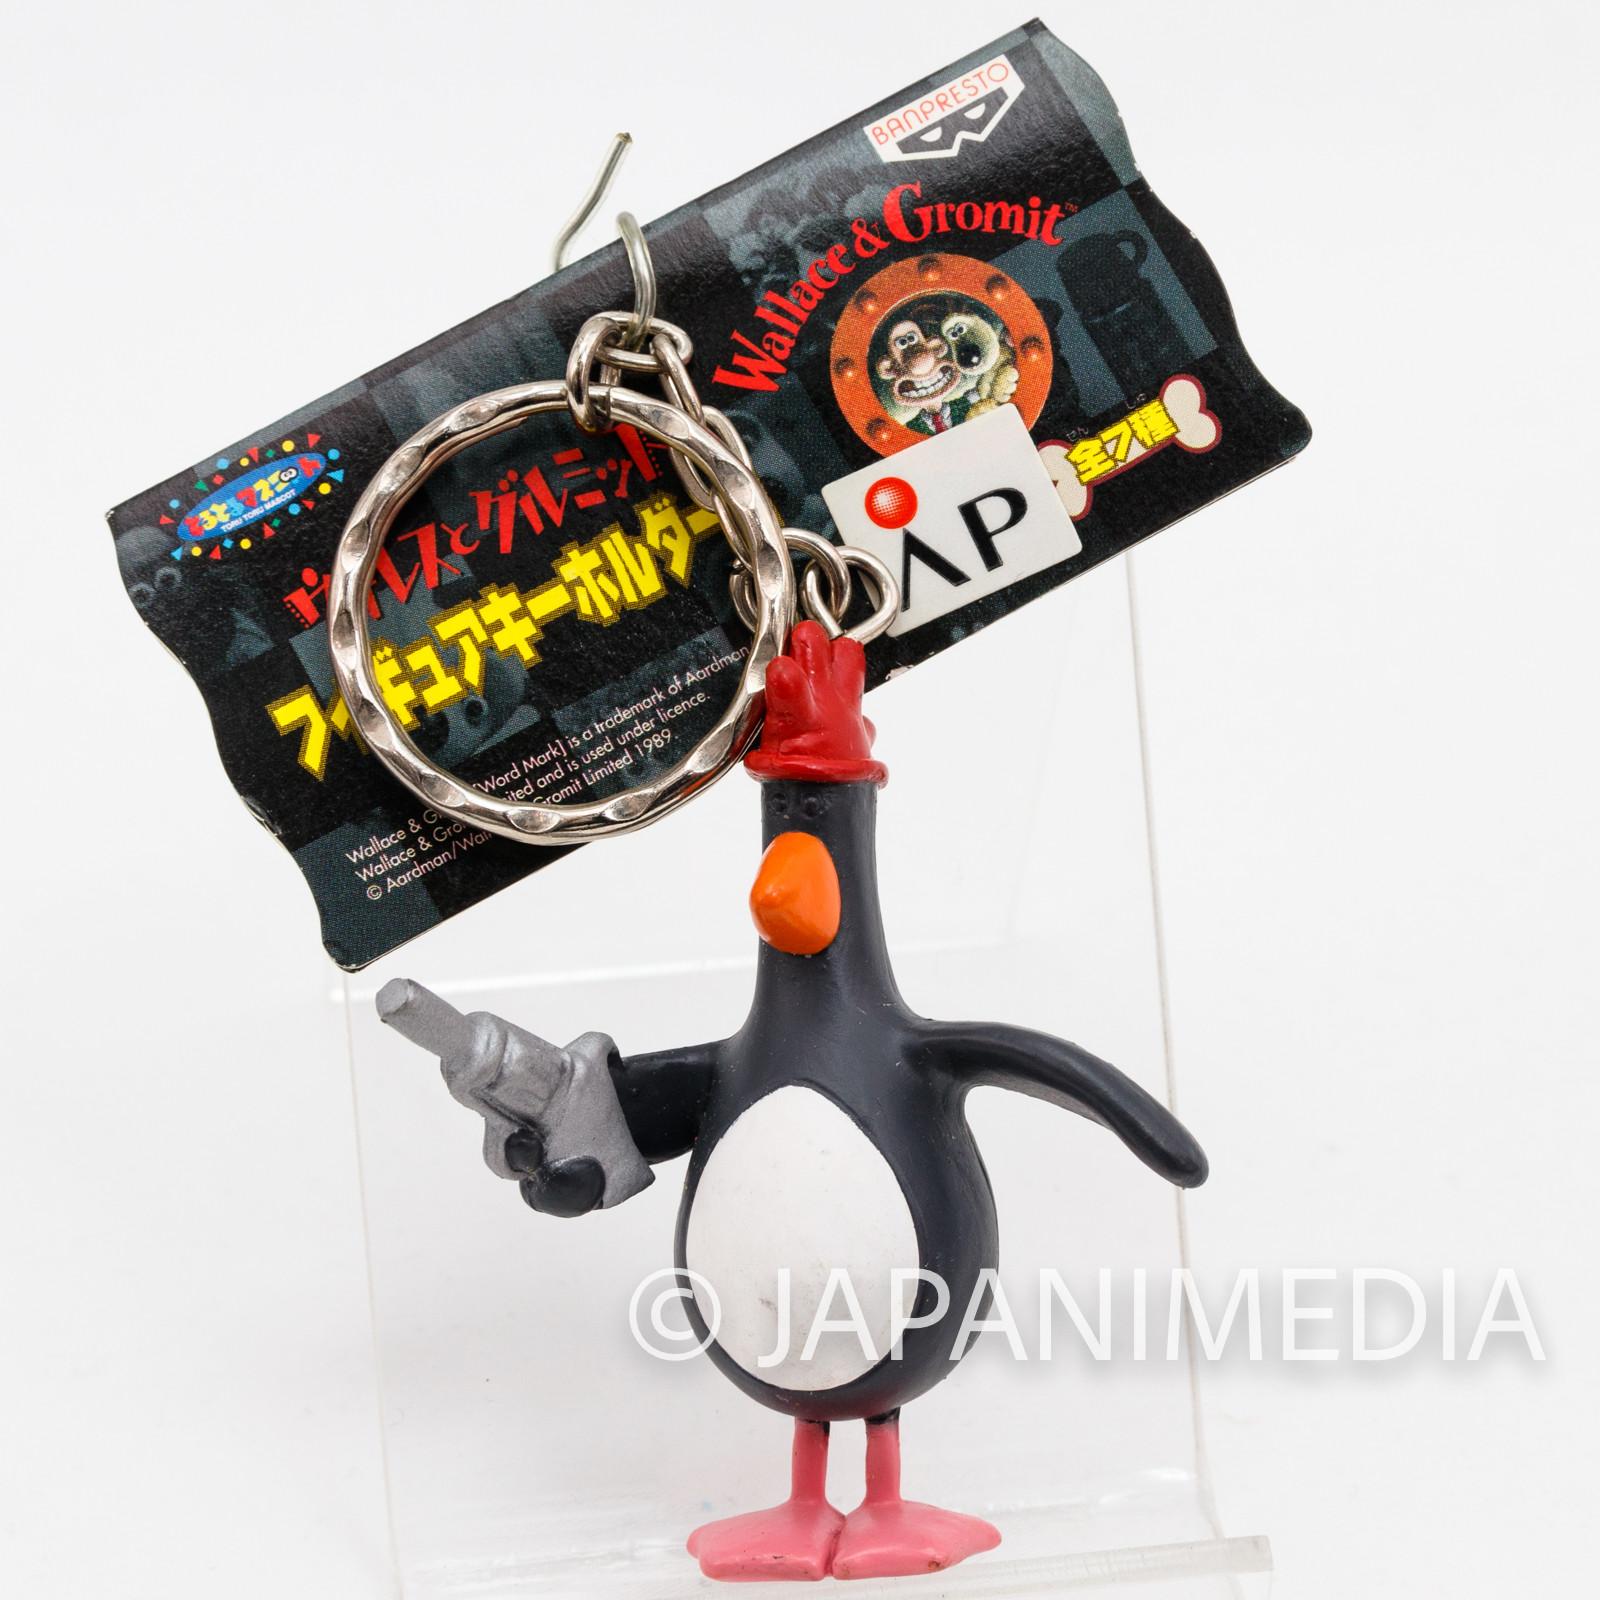 Wallace & Gromit Feathers McGraw Figure Key Chain 2 Banpresto JAPAN Ardman ANIME